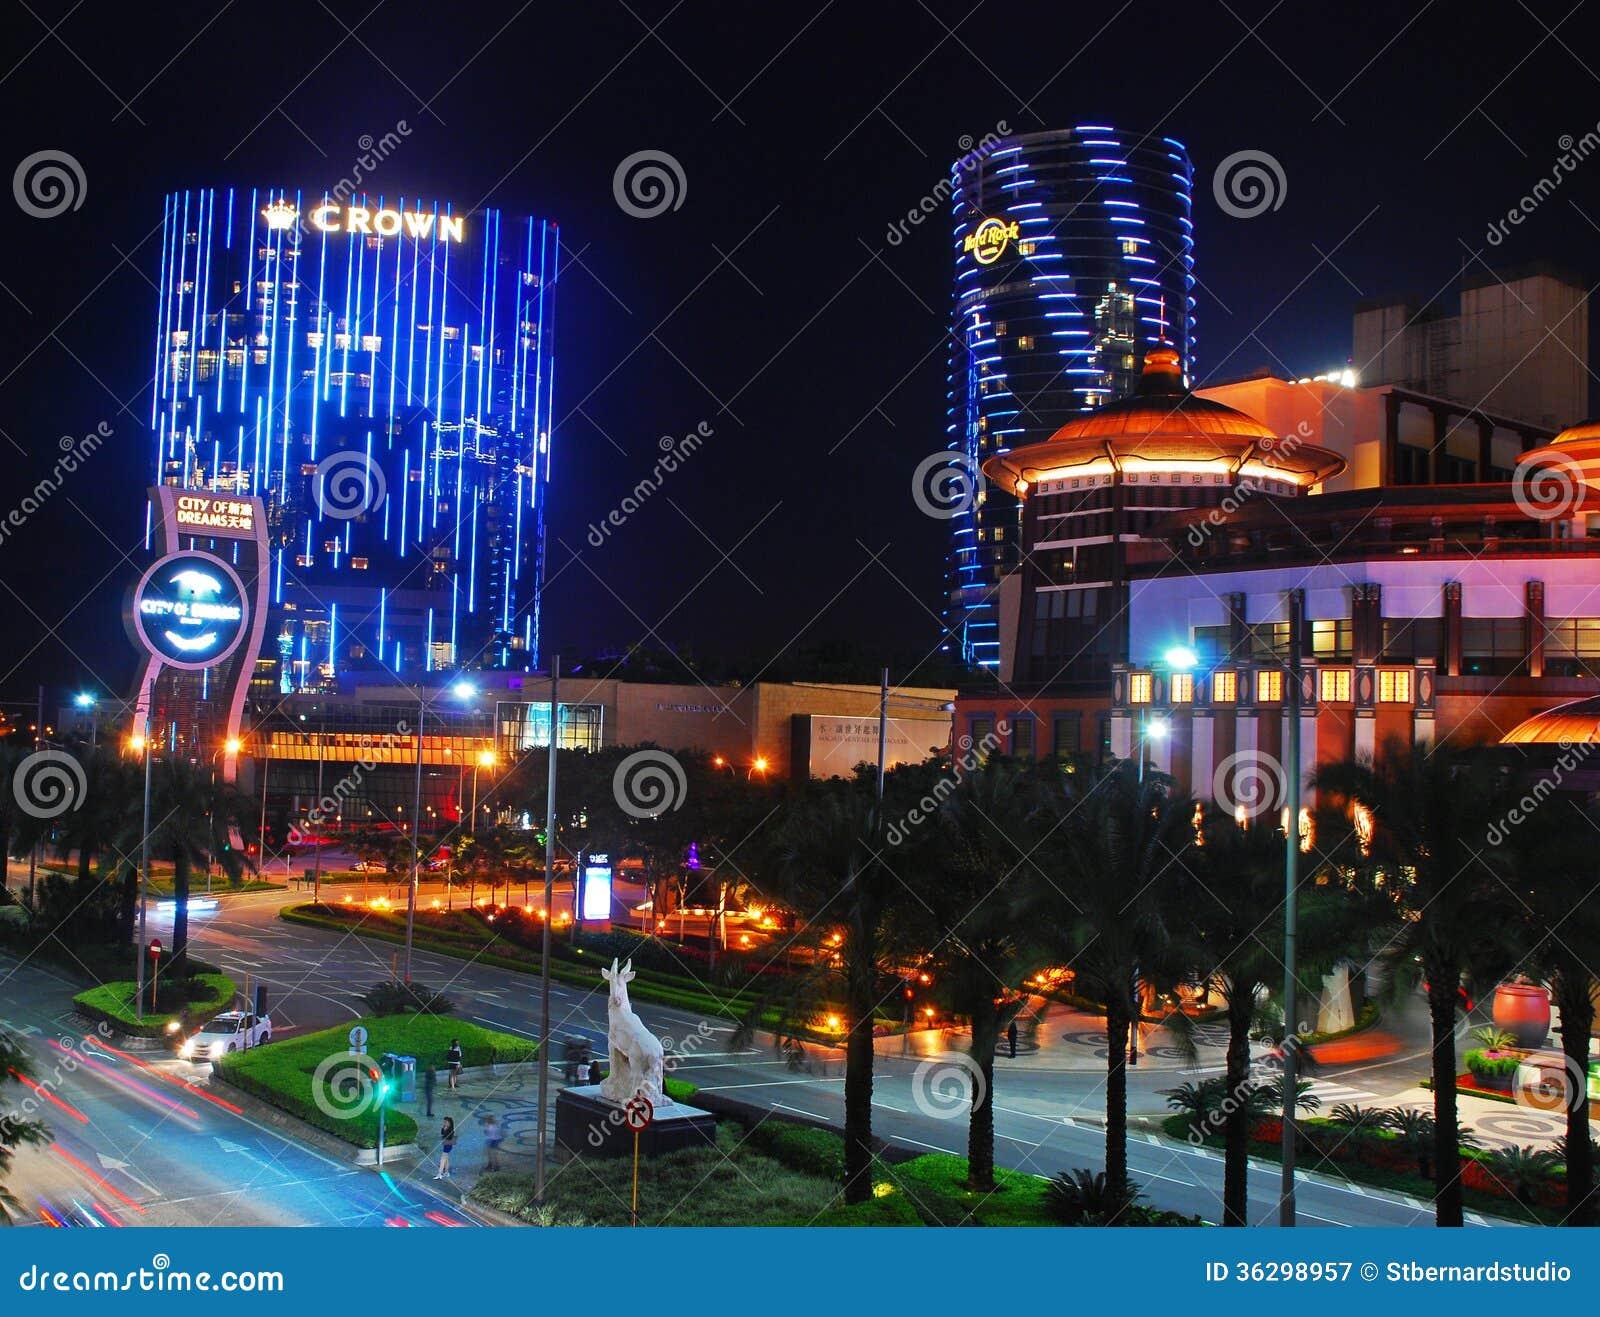 Crown casino closing times